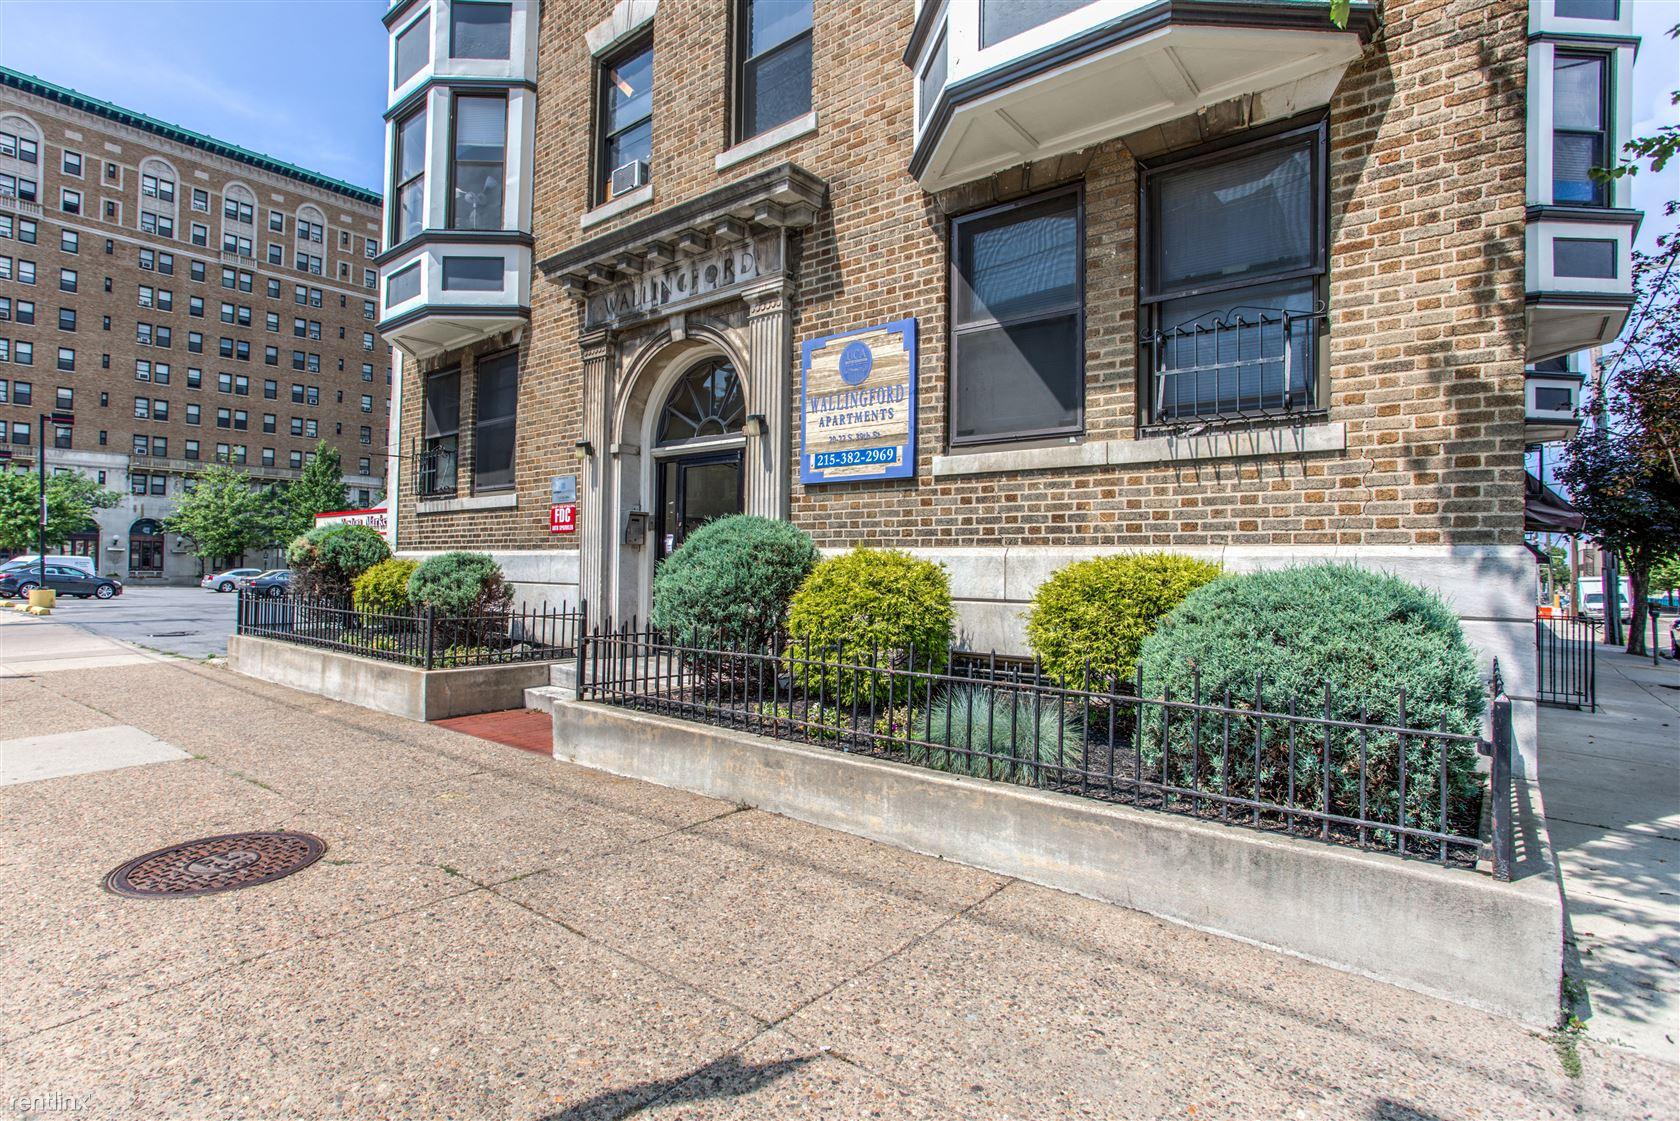 20 S 39th St, Philadelphia, PA - $4,075 USD/ month